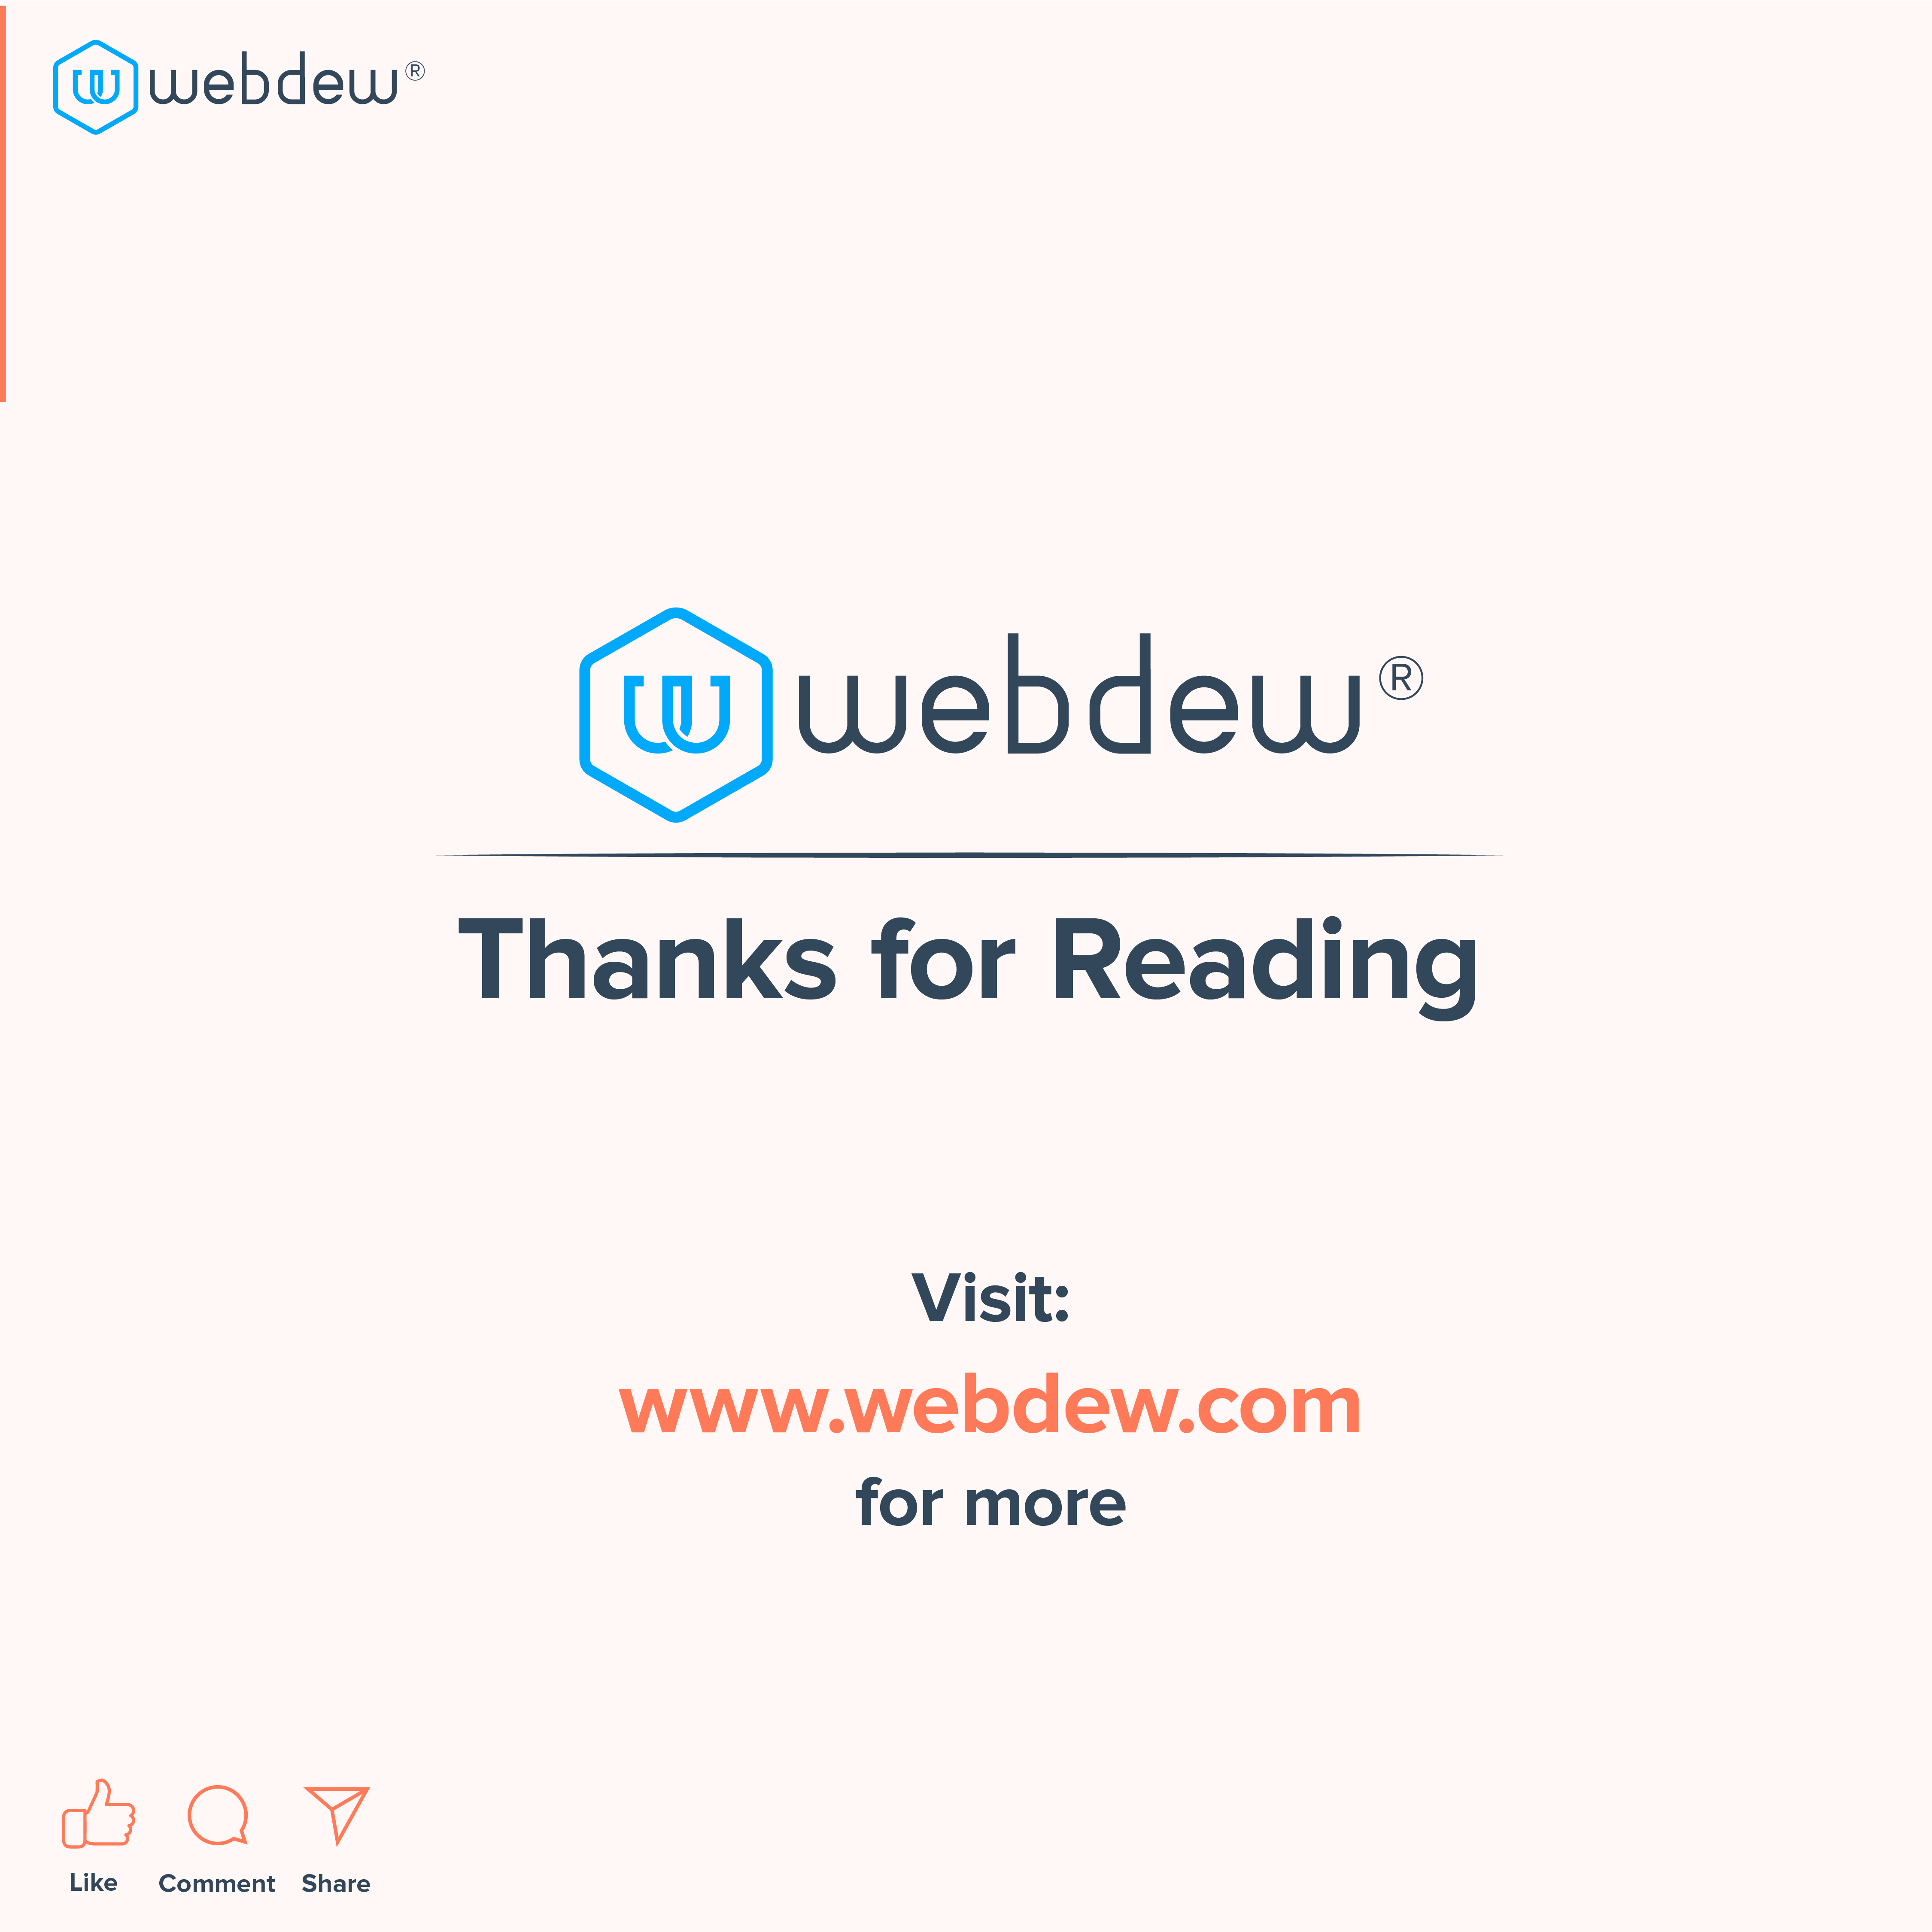 7. thanks for reading-2